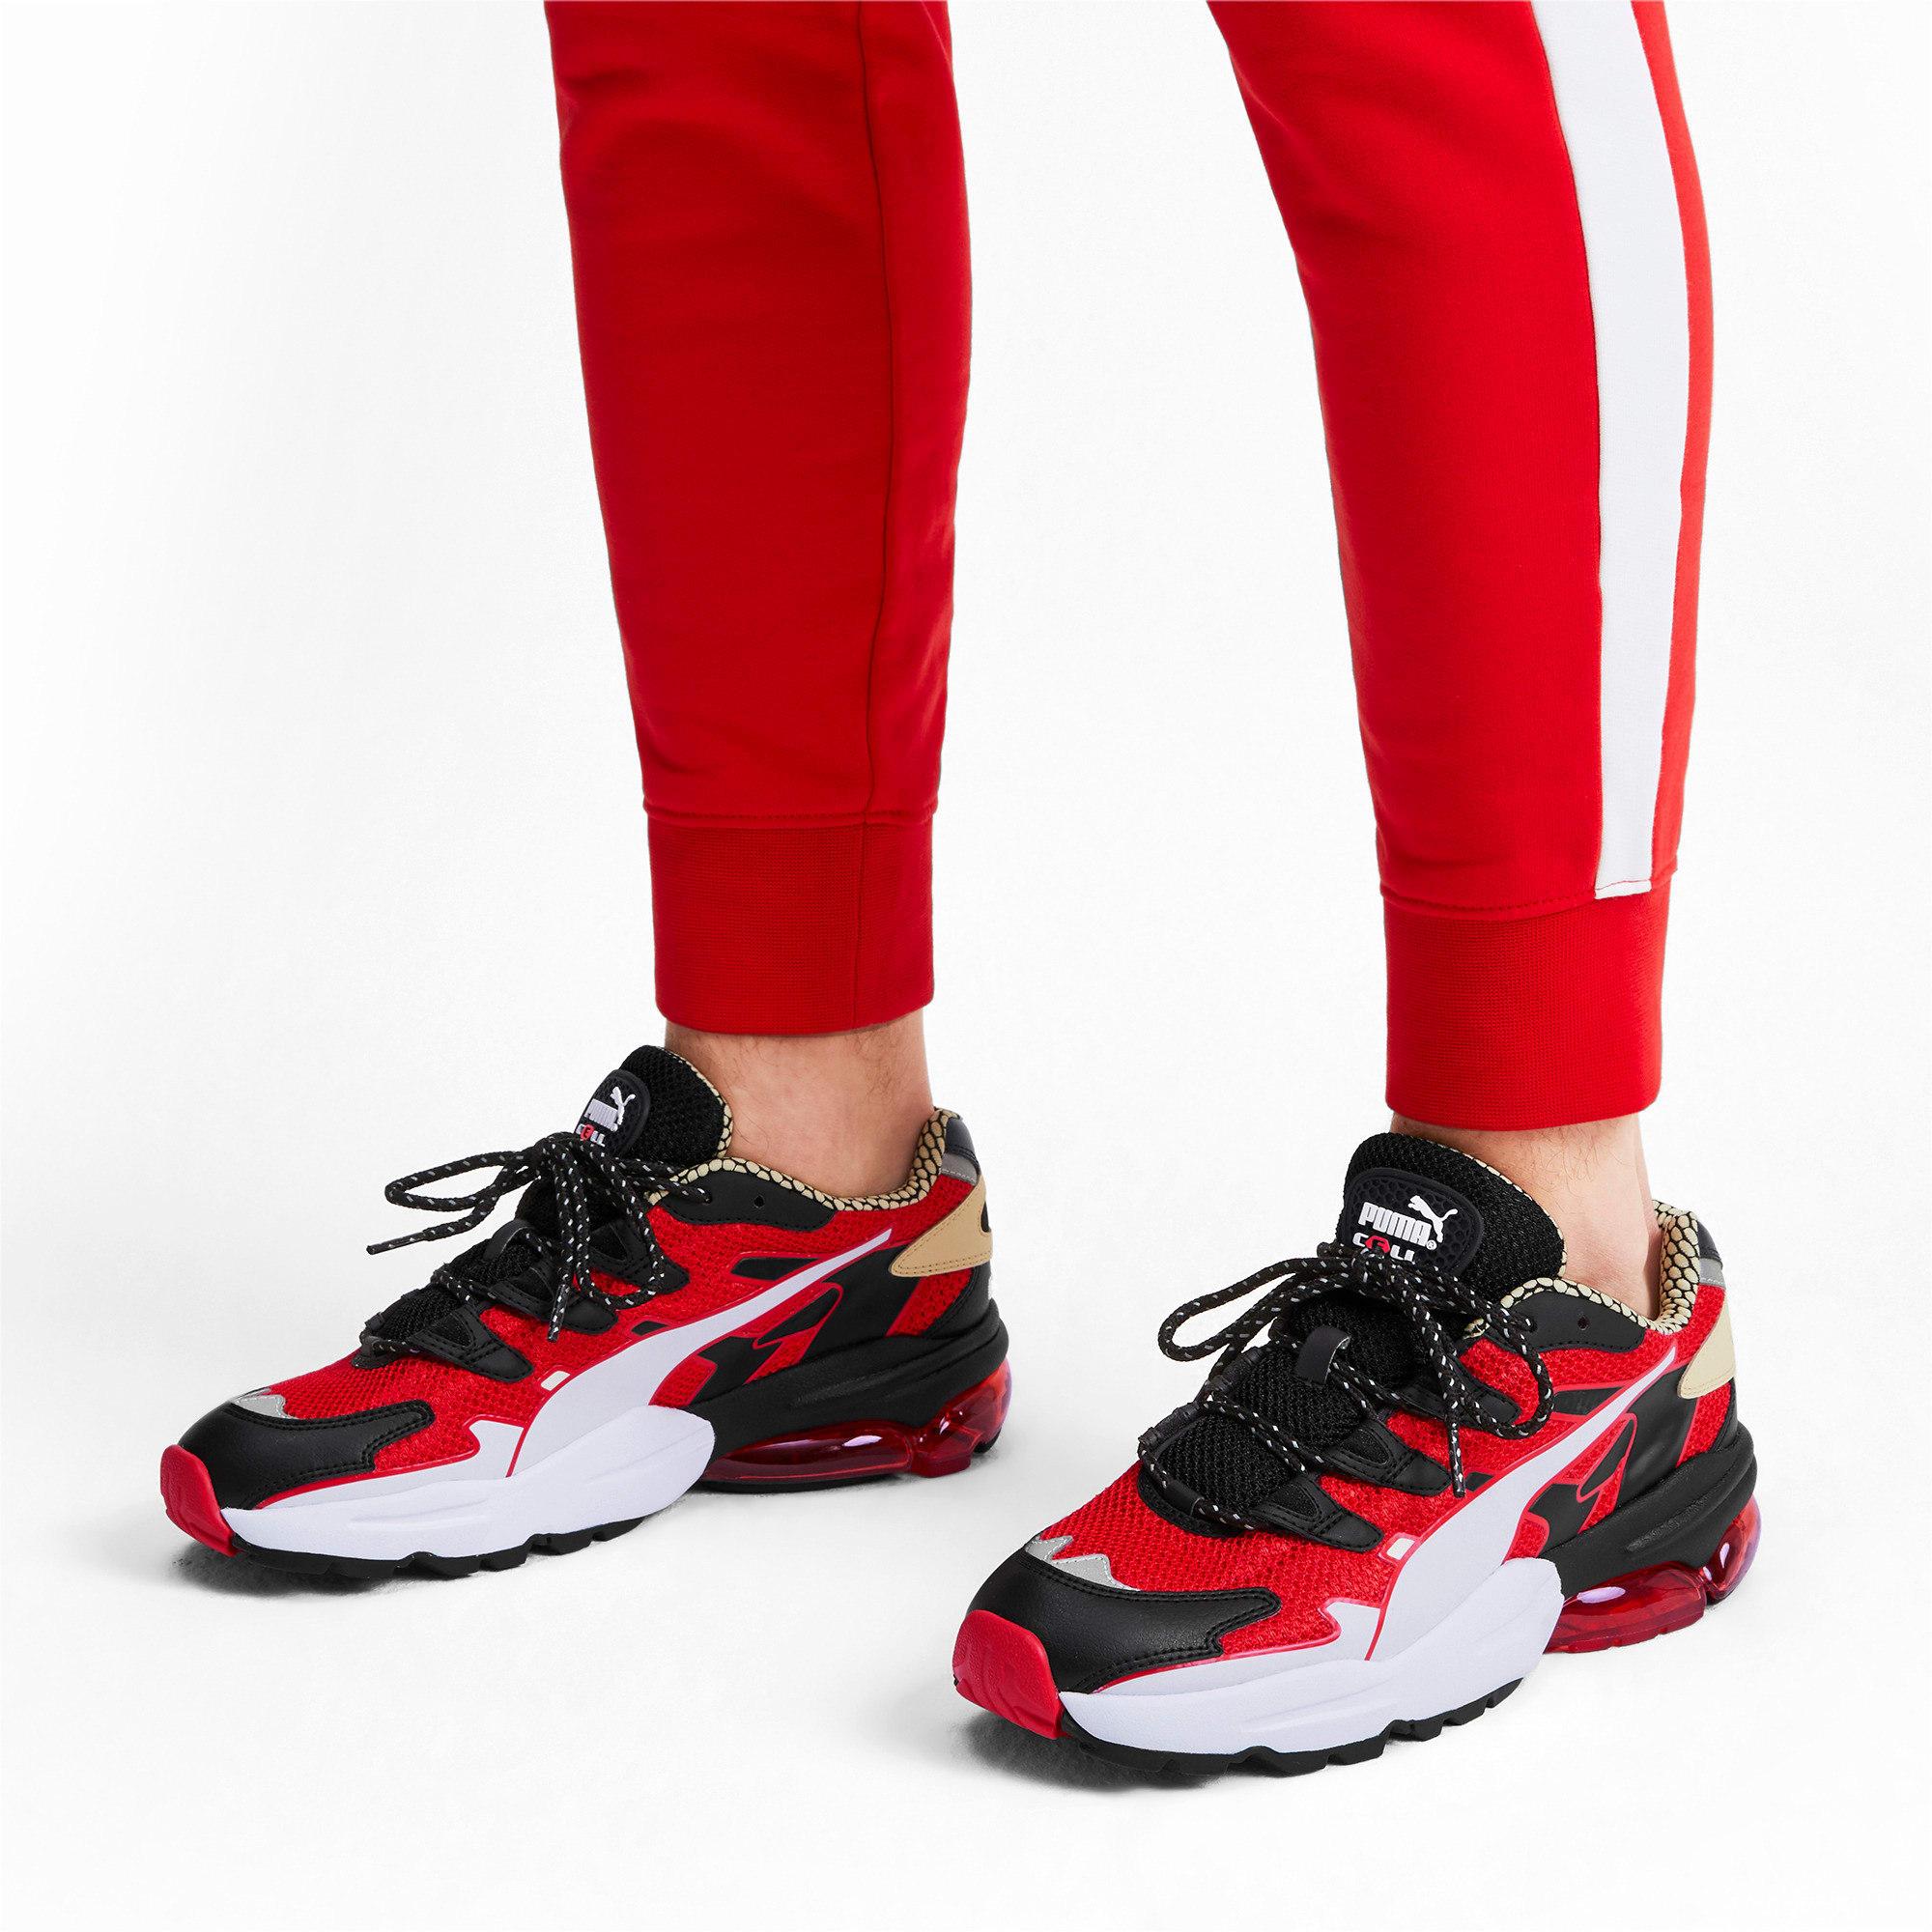 Thumbnail 2 of CELL Alien Kotto Sneakers, High Risk Red-Puma Black, medium